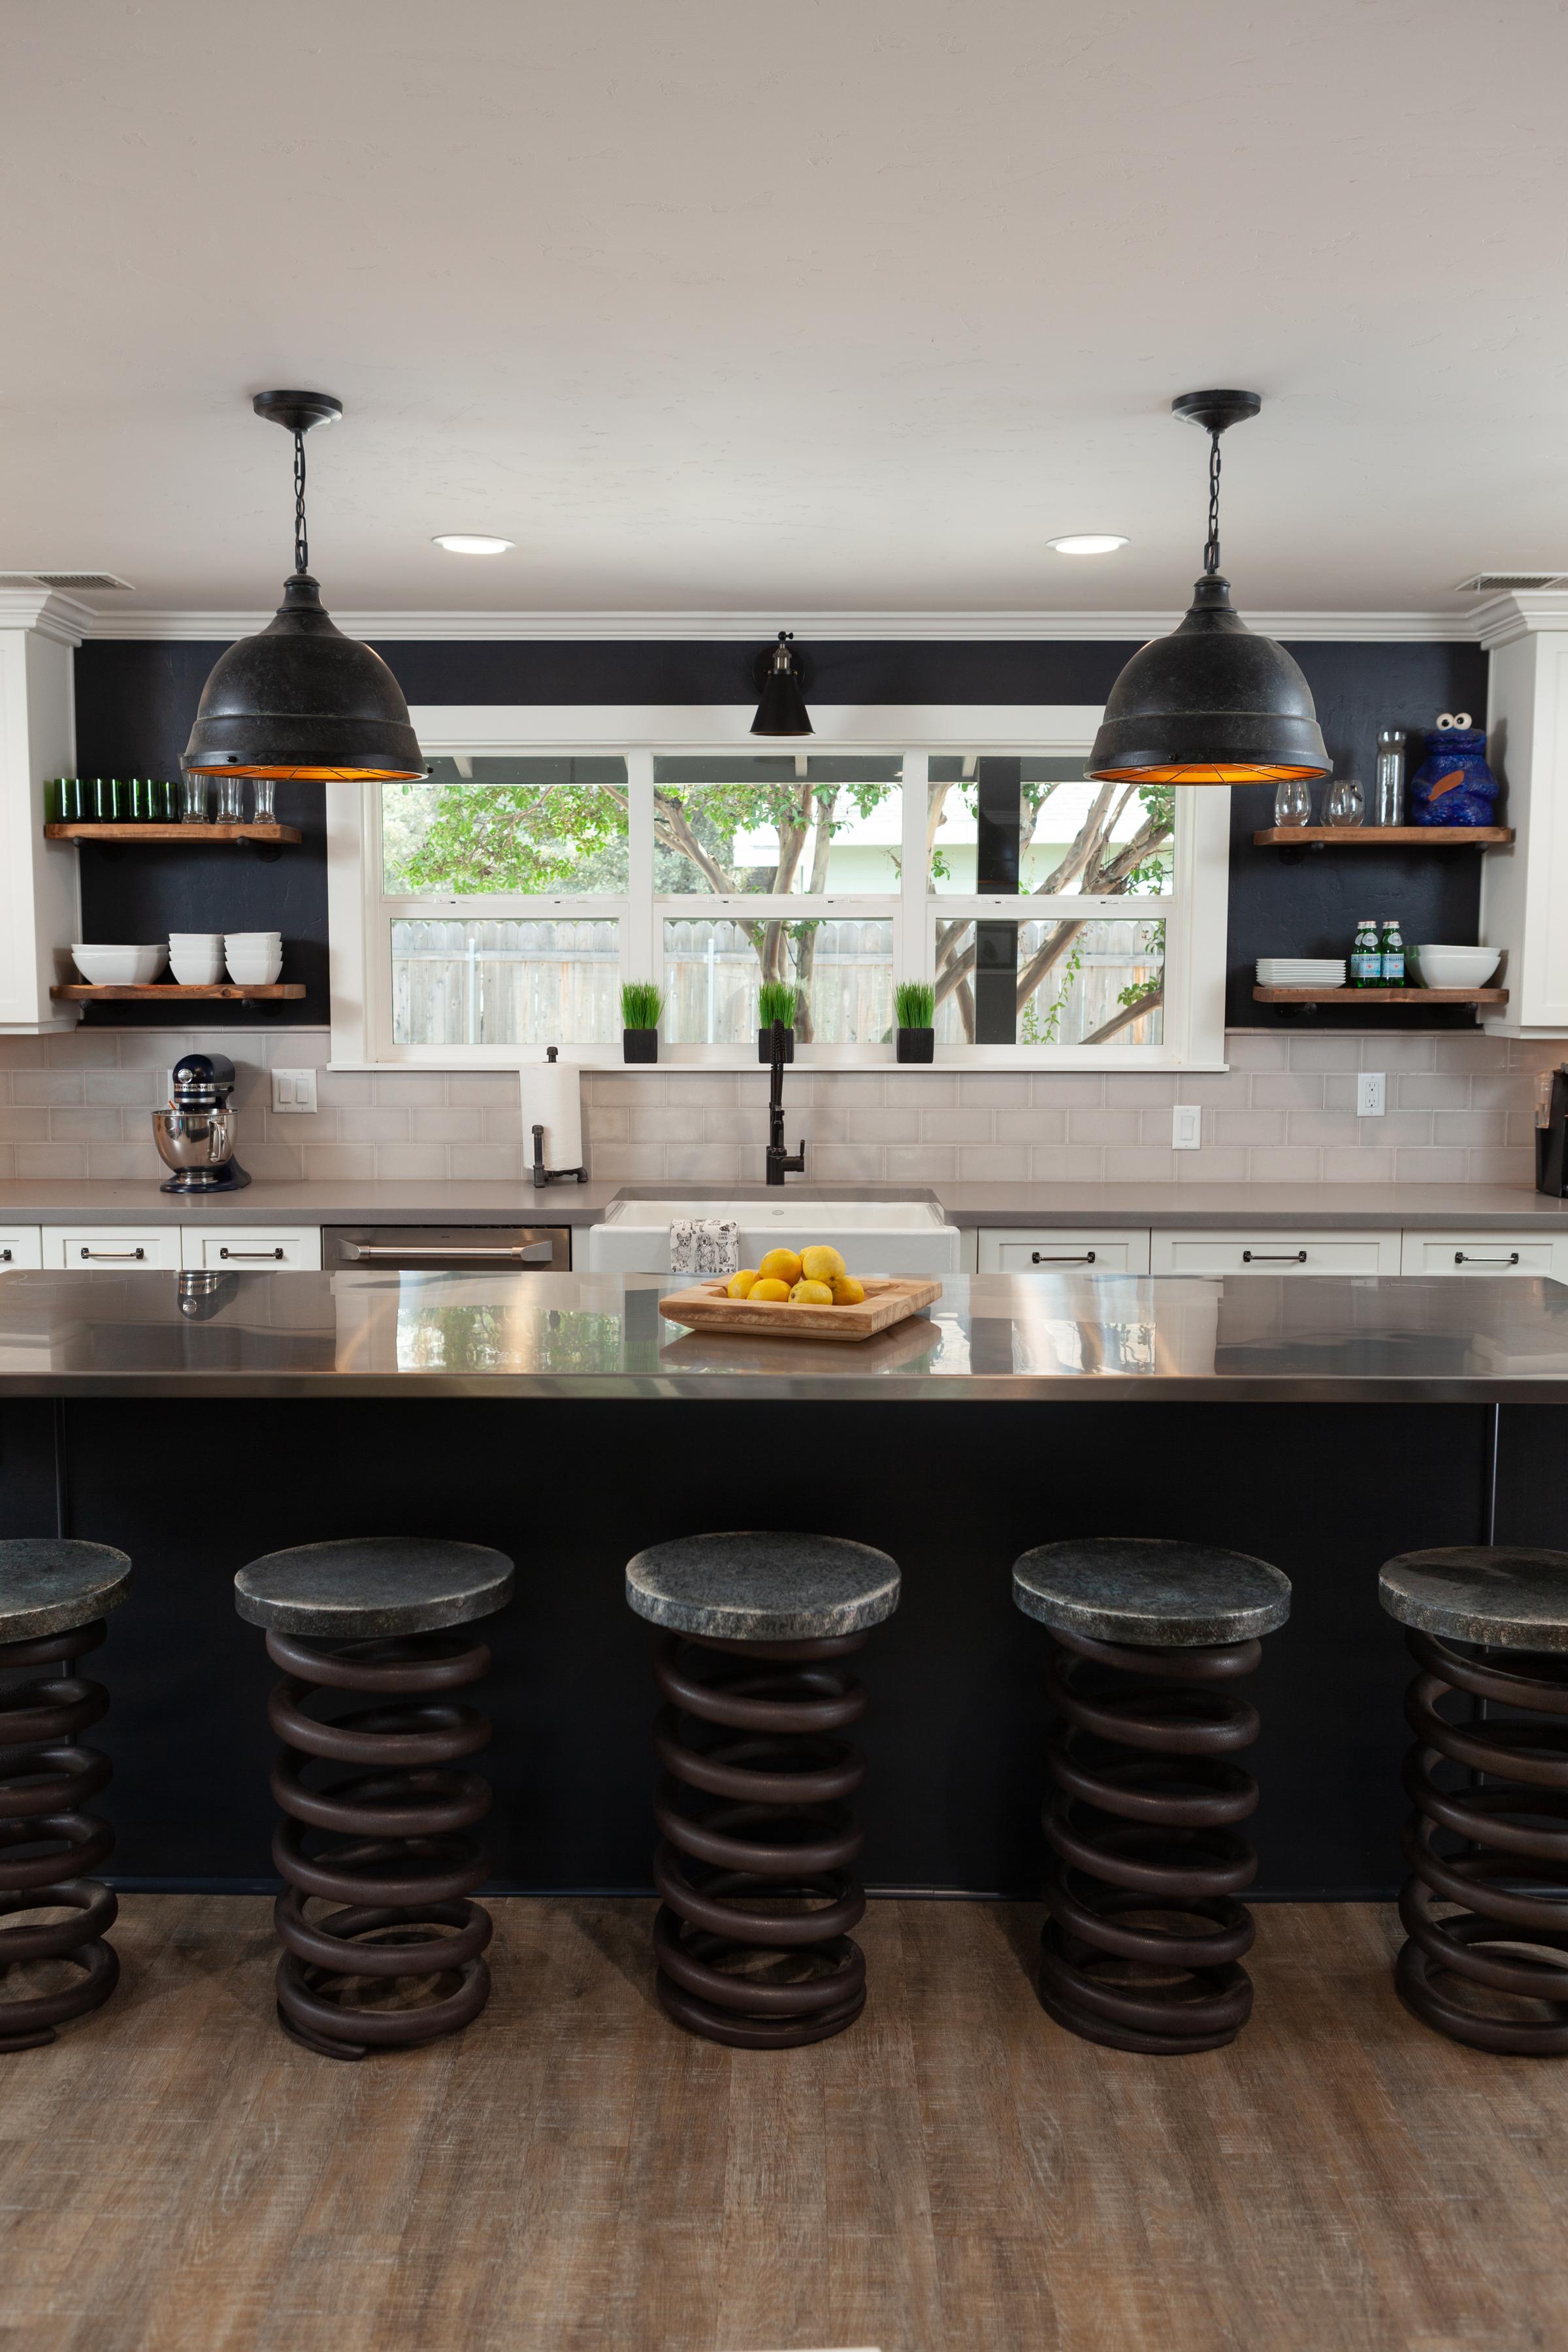 Loma Linda Kitchen & Bathroom Remodel Project by Lori K Design Studio